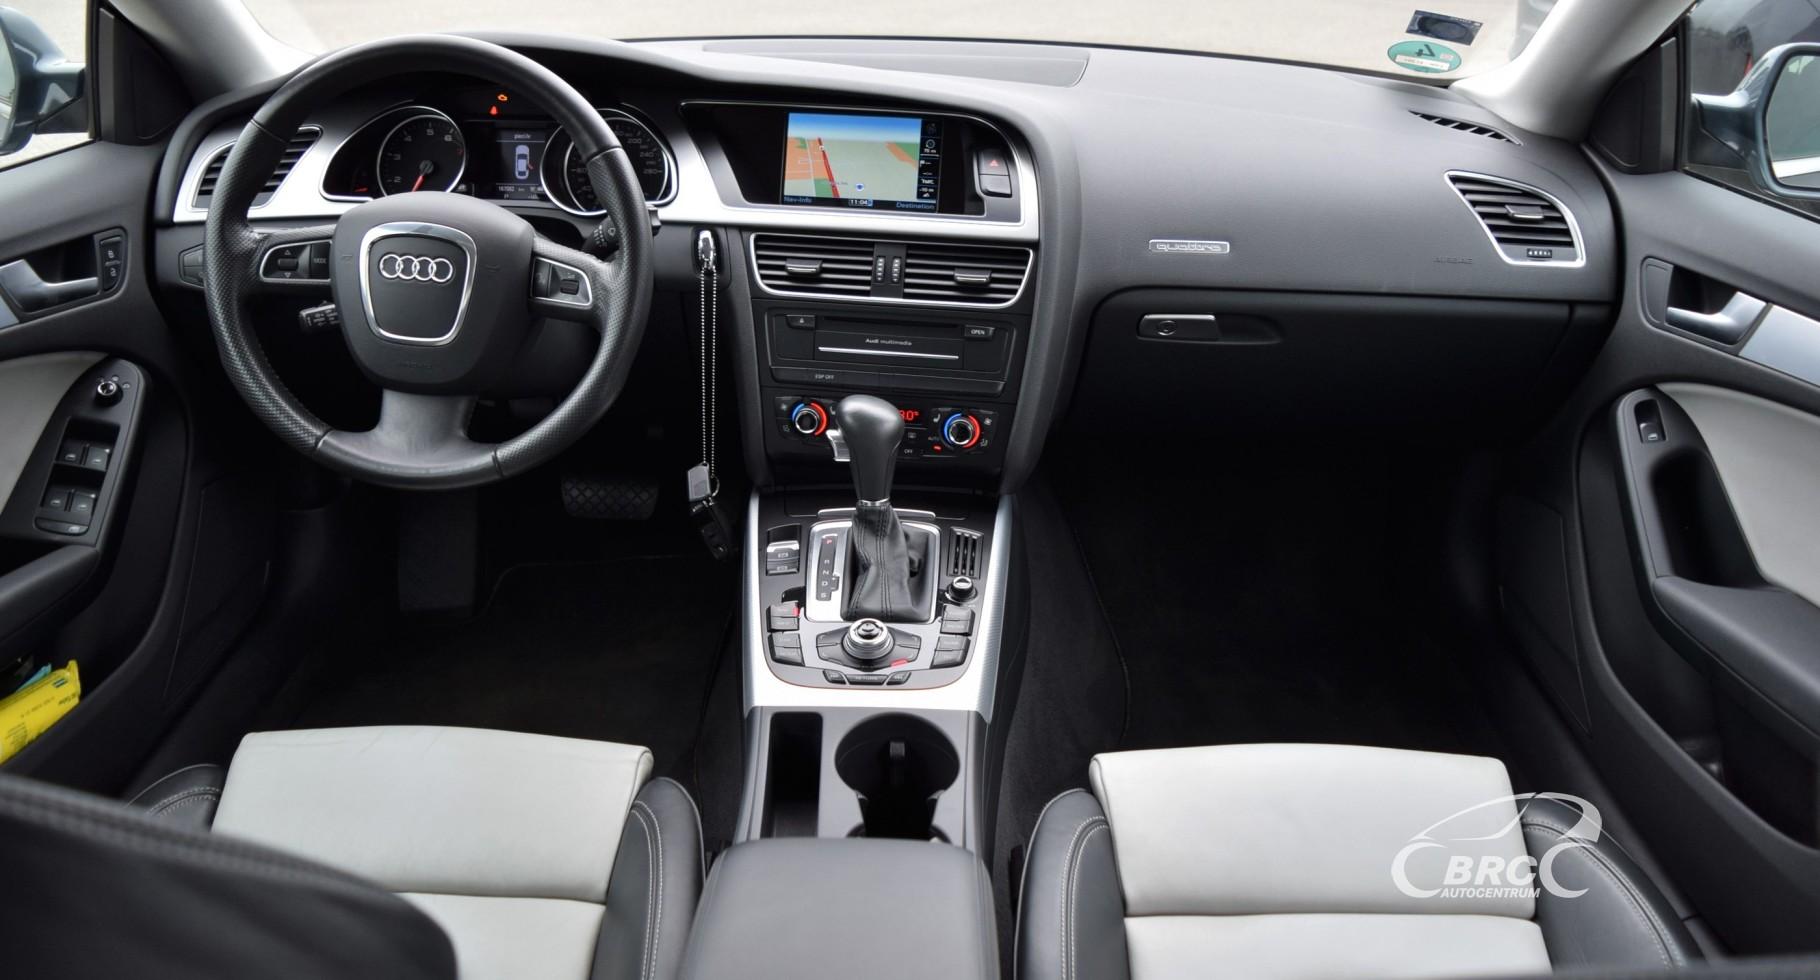 Audi A5 Sportback Quattro TFSI